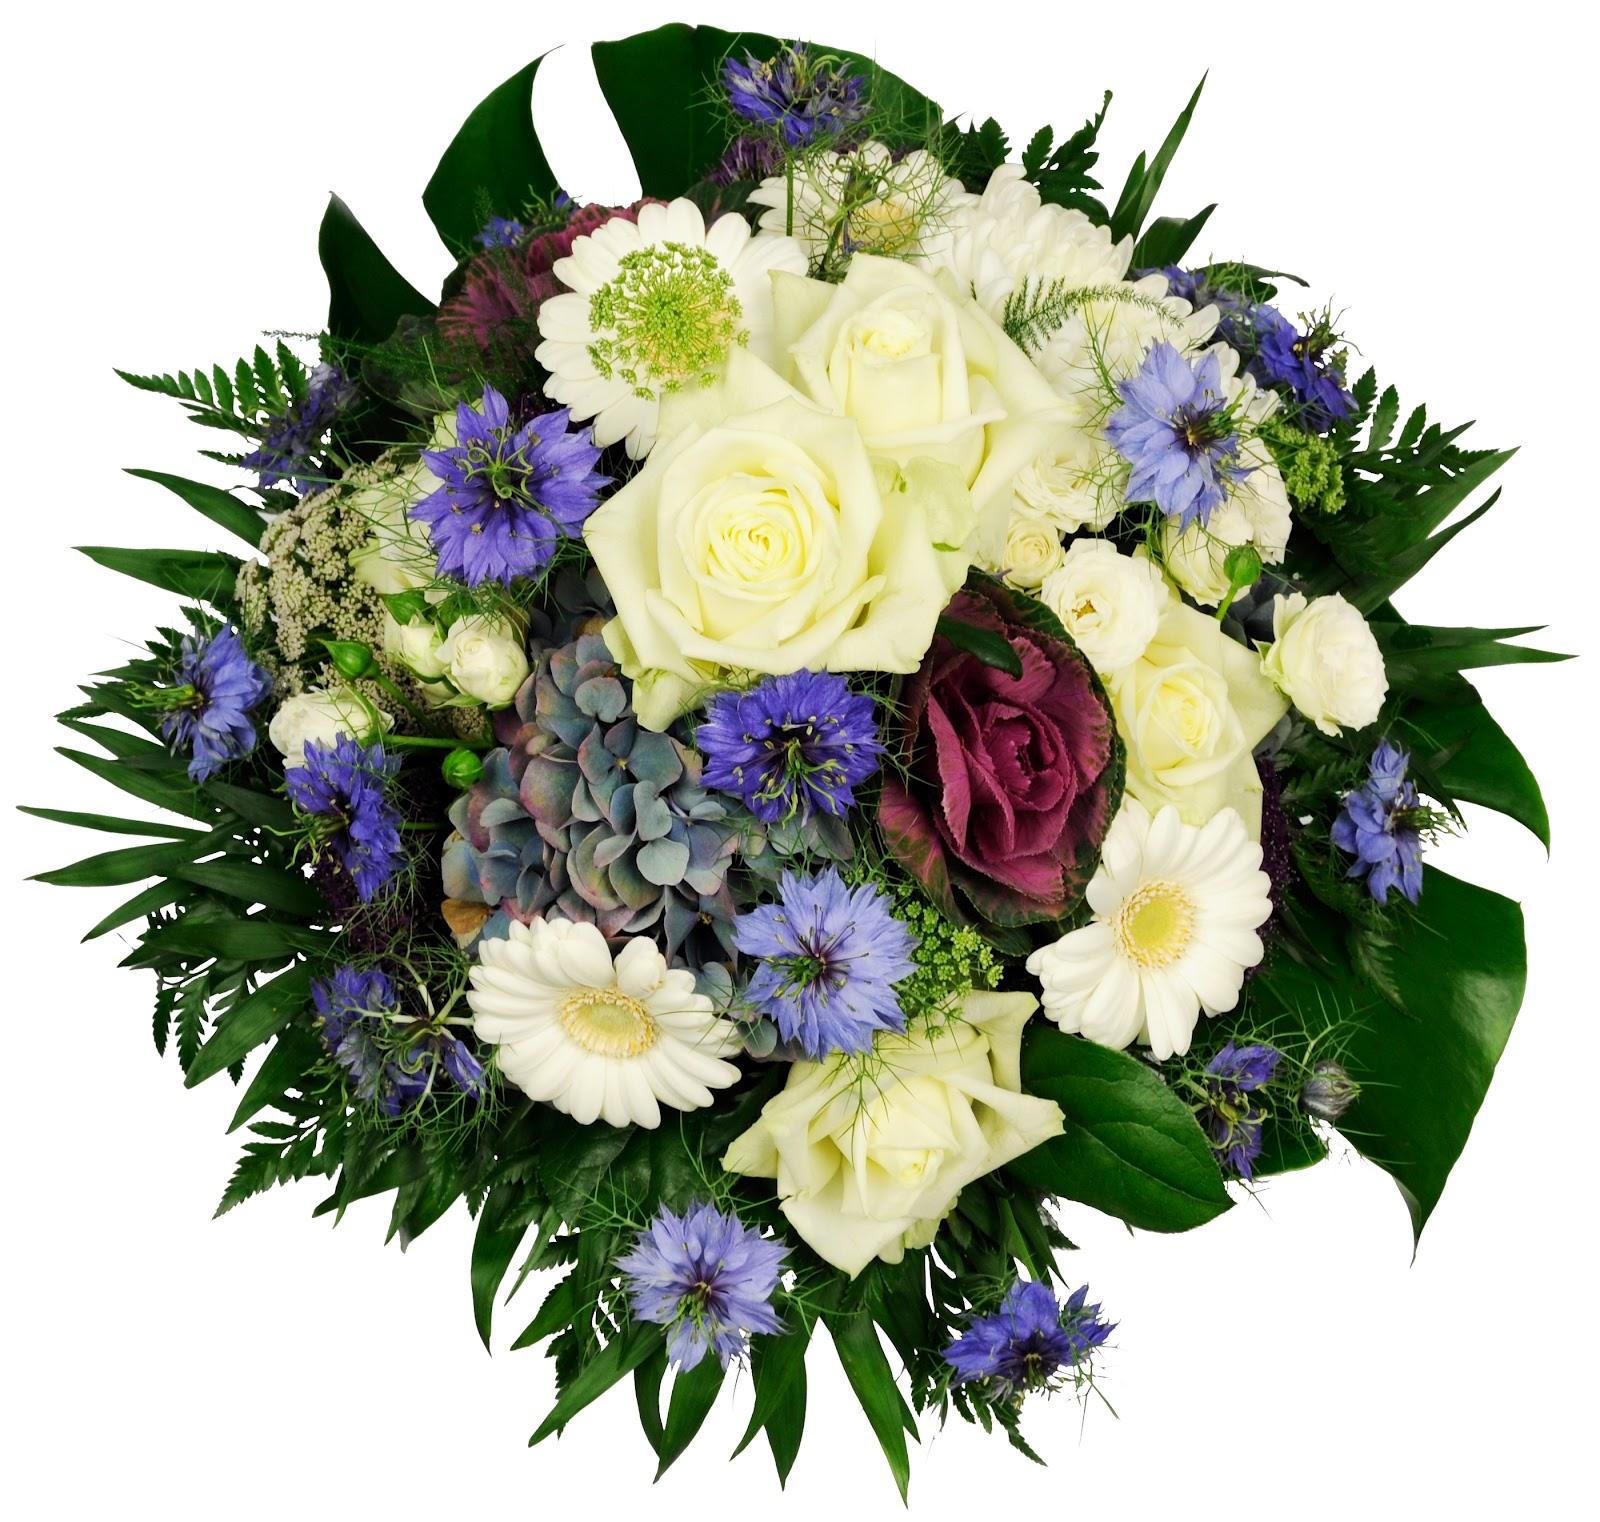 Wedding Anniversary Flower: Flower Delivery Services: Make Your Wedding Anniversary